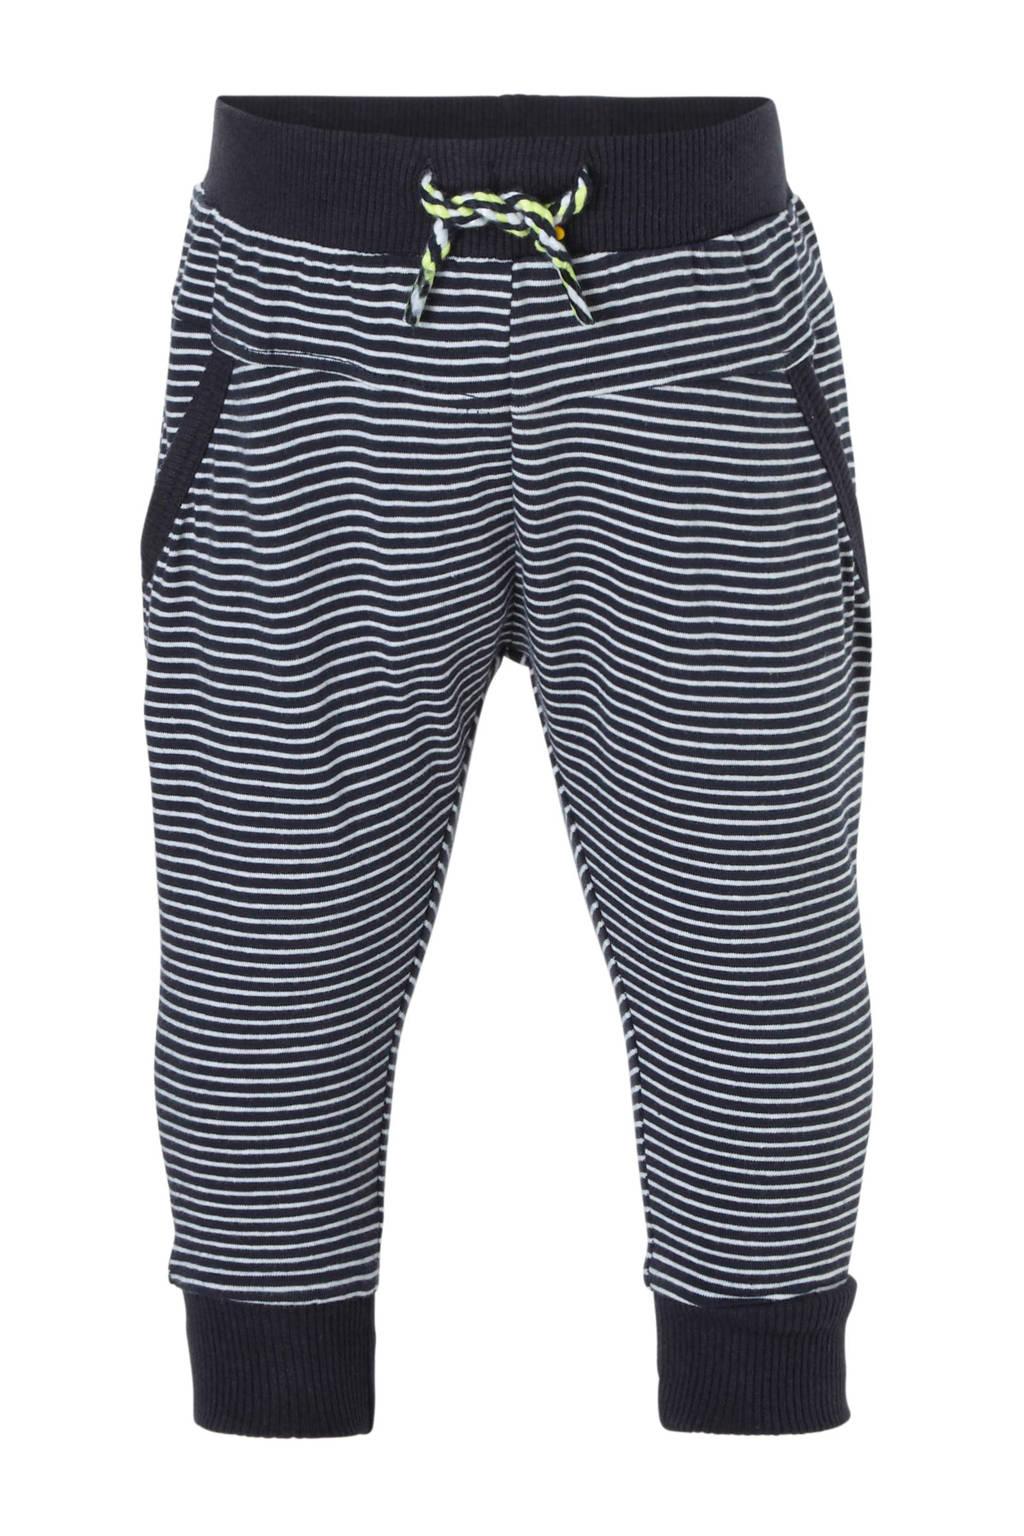 Dirkje   gestreepte joggingsbroek blauw, Donkerblauw/wit